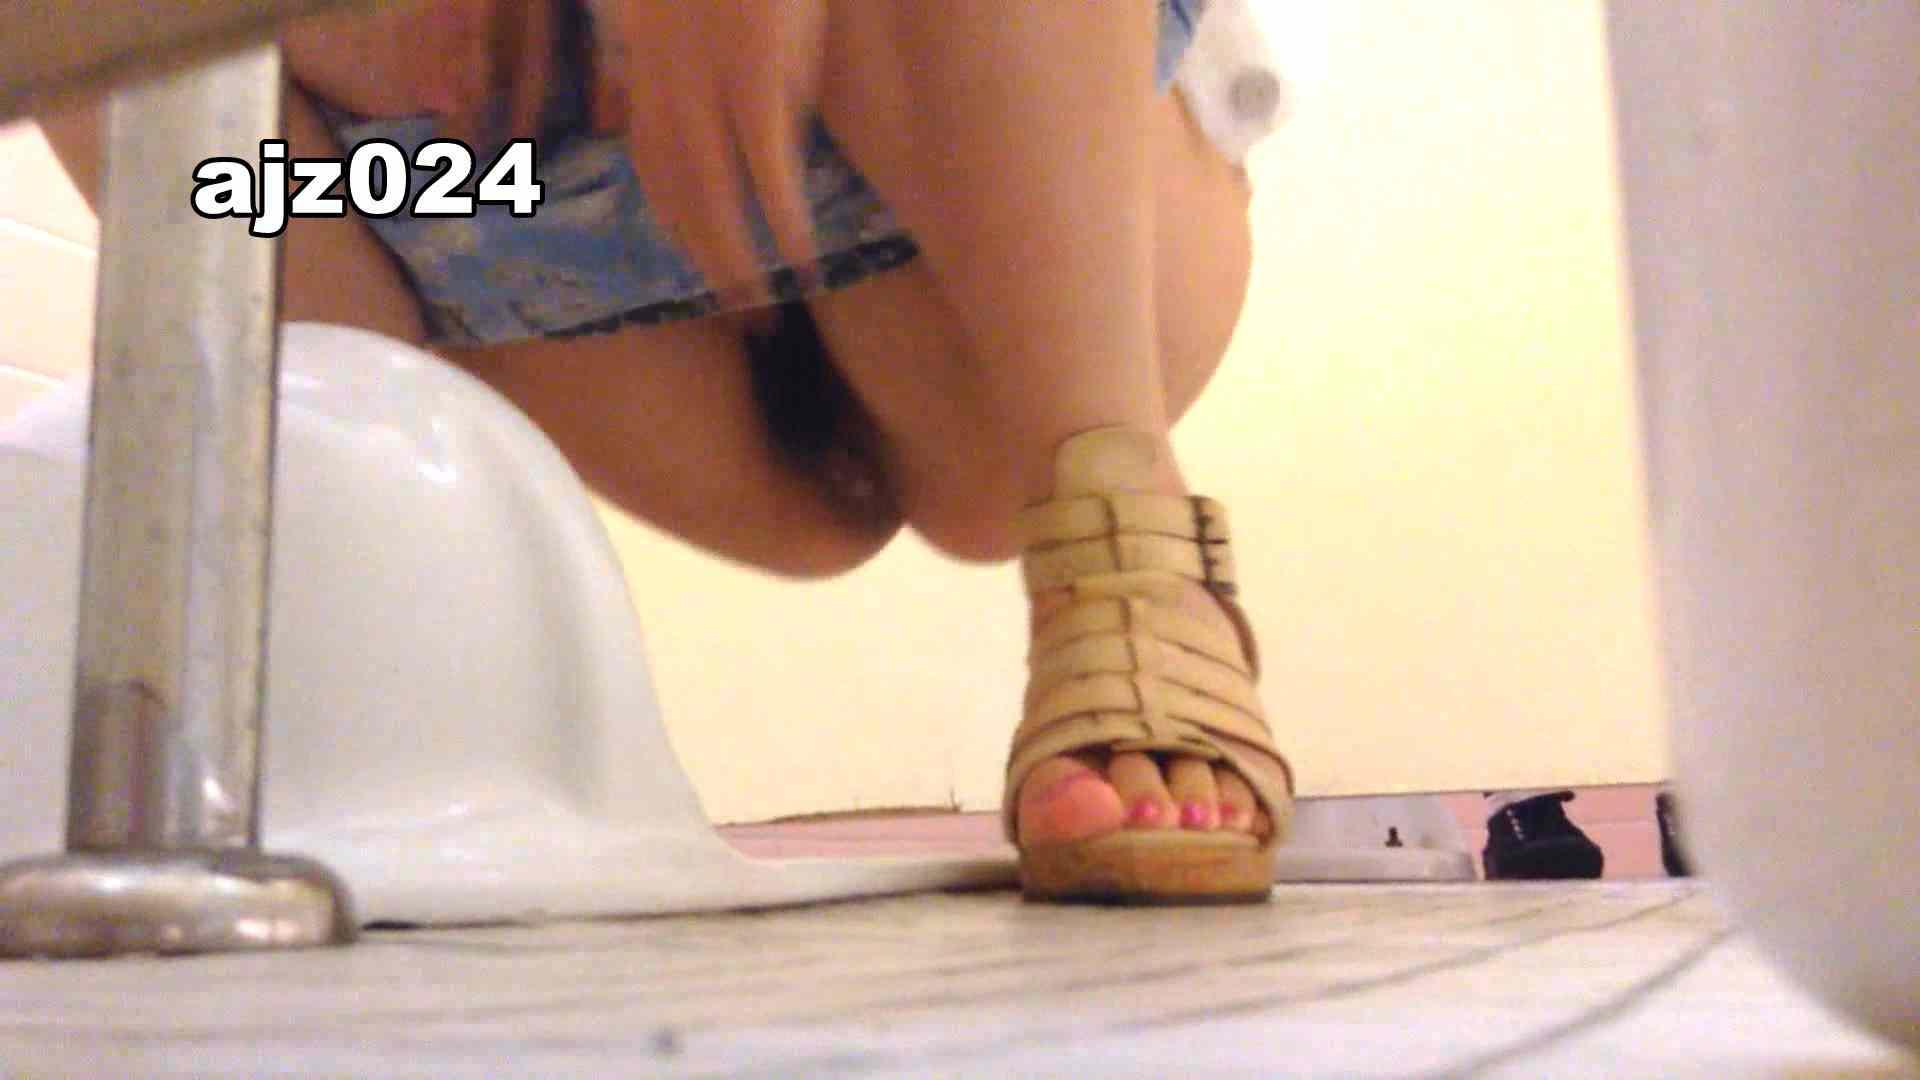 某有名大学女性洗面所 vol.24 OL女体 AV動画キャプチャ 66連発 56